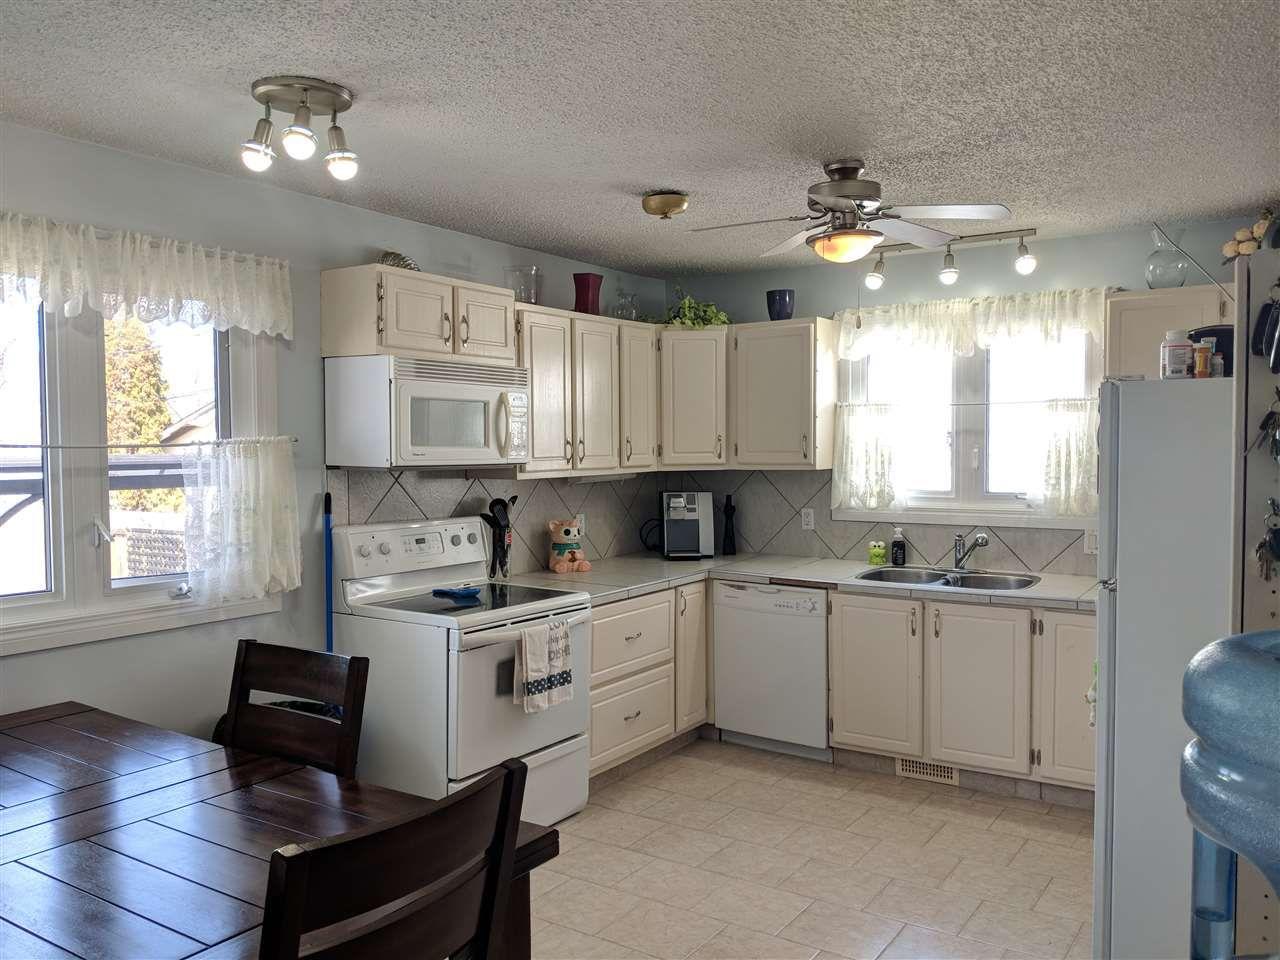 Photo 2: Photos: 4740 48 Street S: Clyde House for sale : MLS®# E4152983